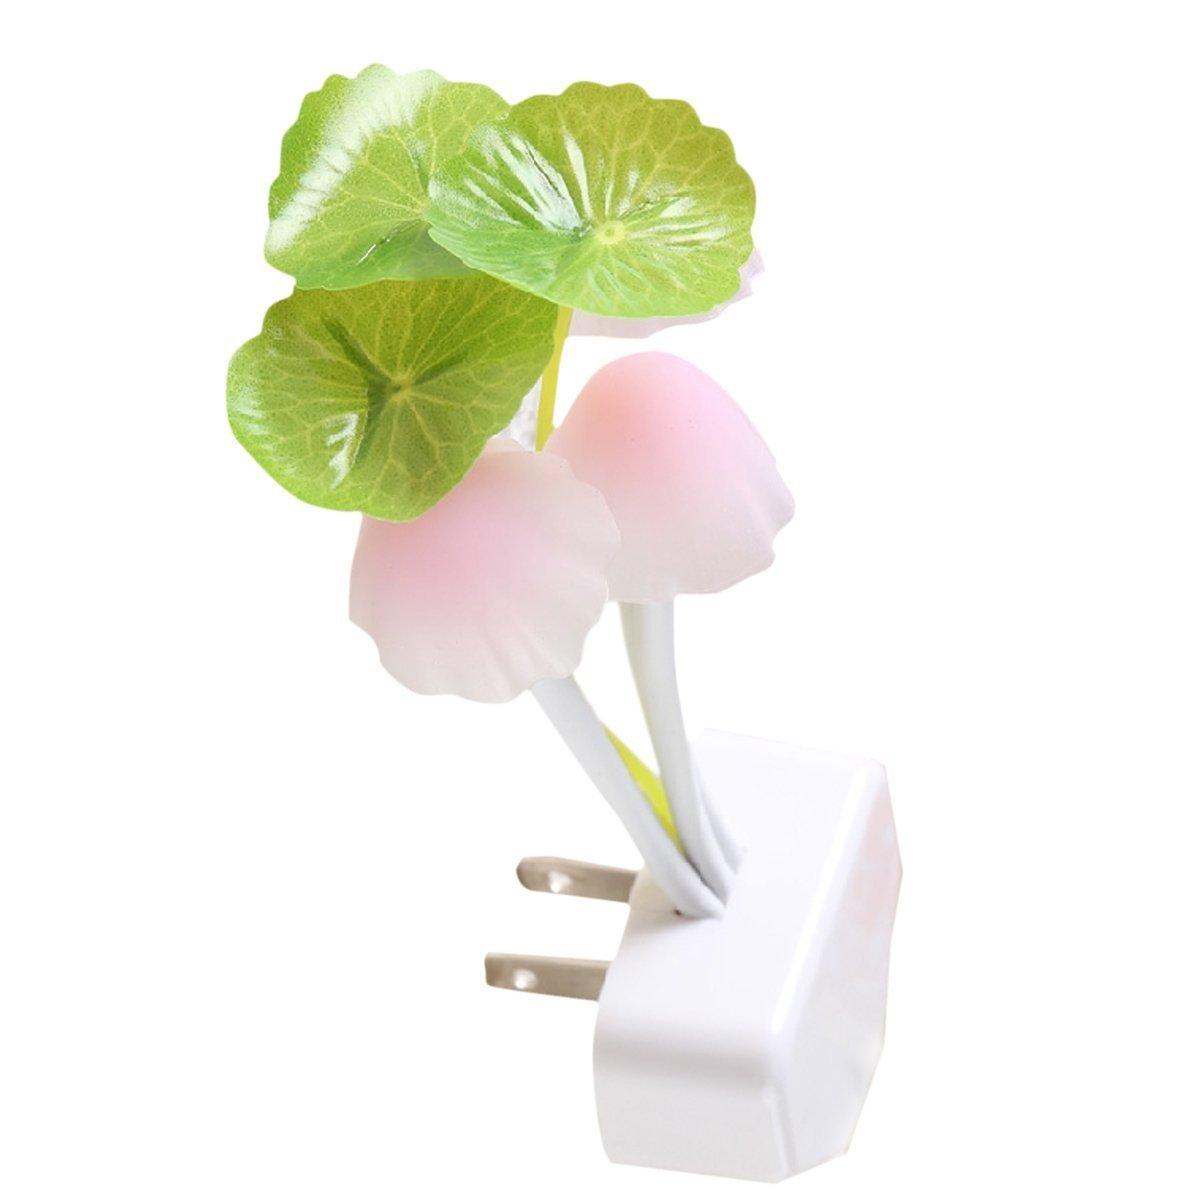 Night lamps india - Nicerocker New Energy Saving Creative Design Led Night Light For Bed Lamp Home Decor